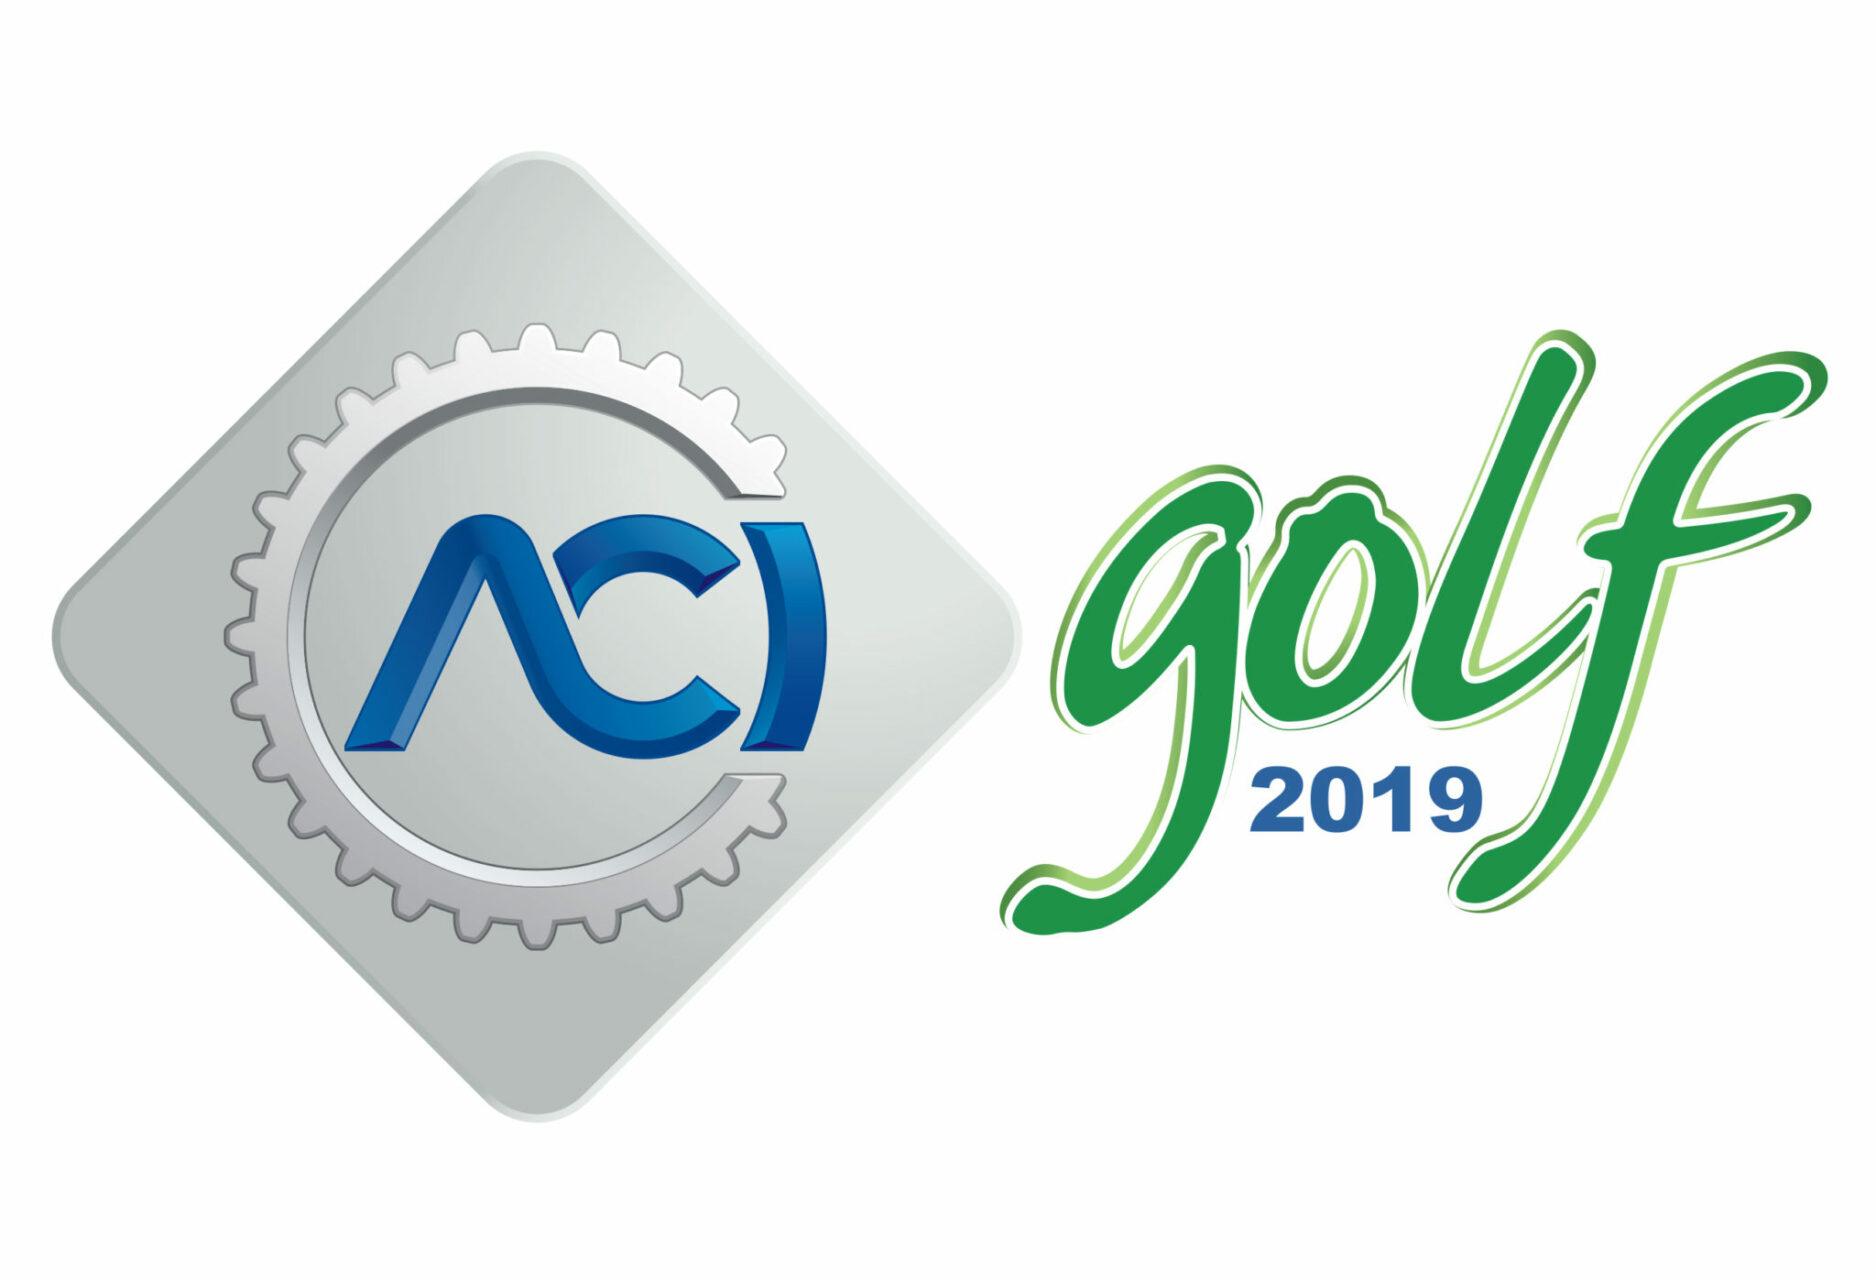 ACI GOLF 2019 Aci Logo Romboa 2019 jpg